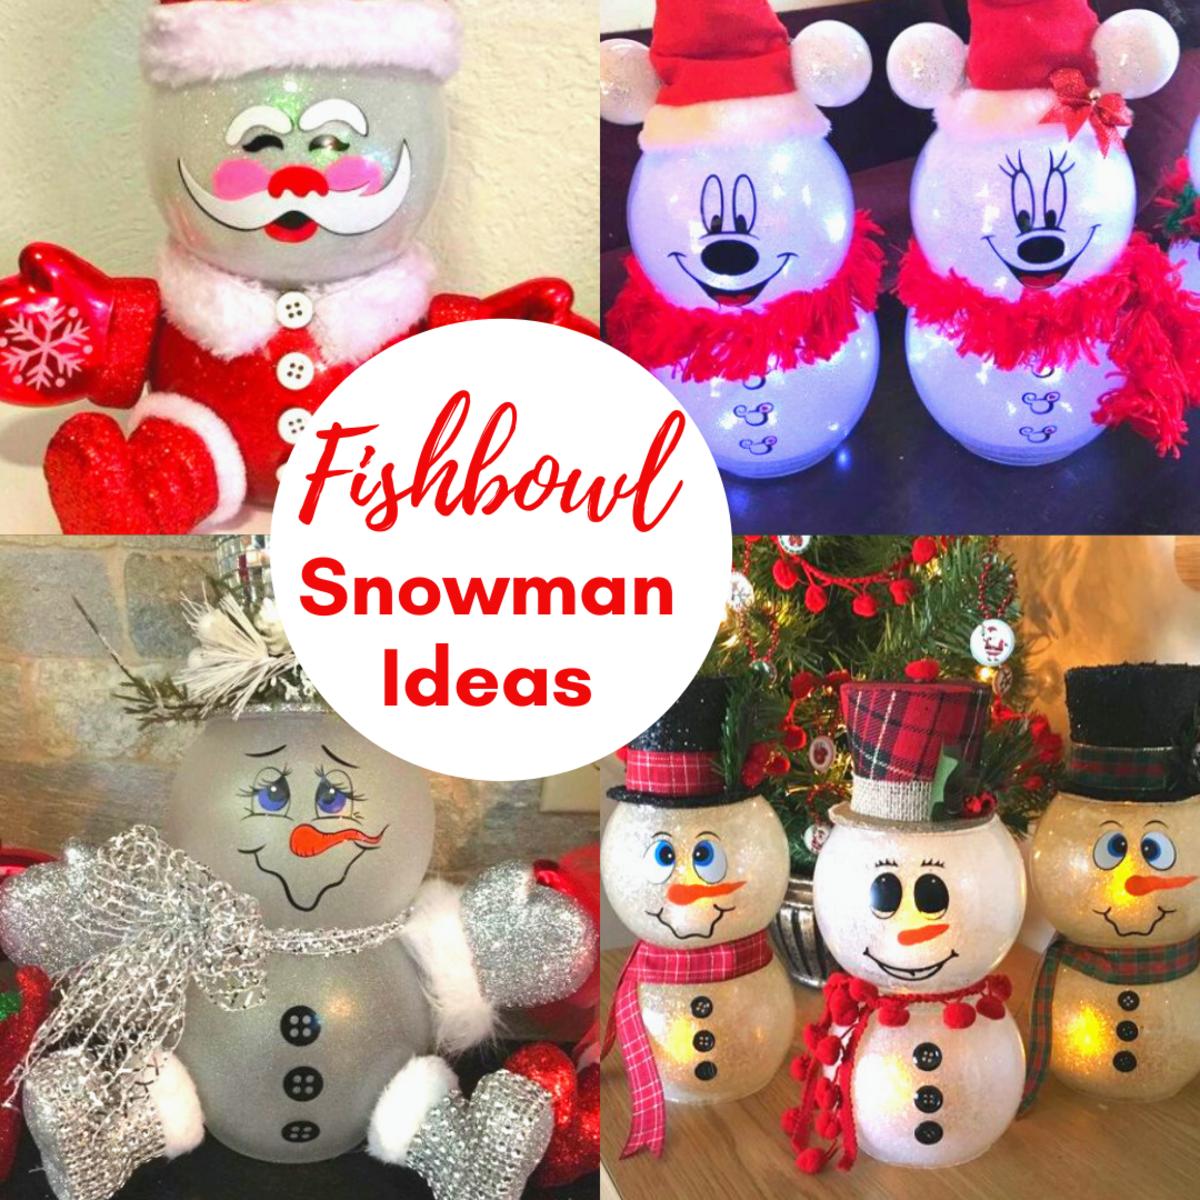 Fish Bowl Snowman Ideas